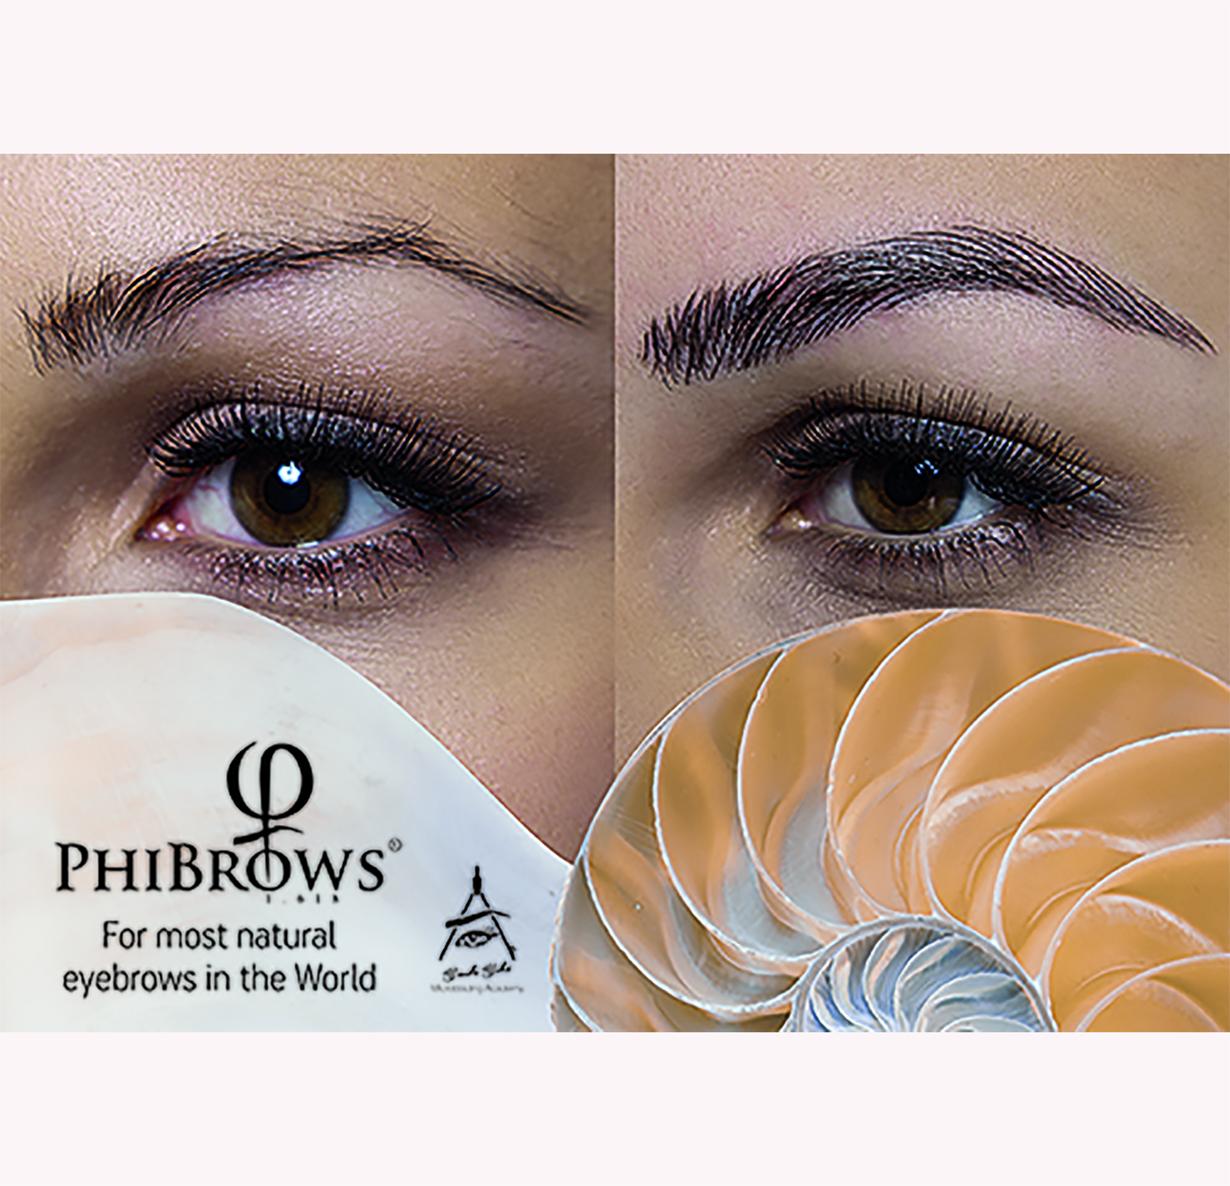 1) PHIBROWS – 3D EYEBROWS MICROBLADING Technique